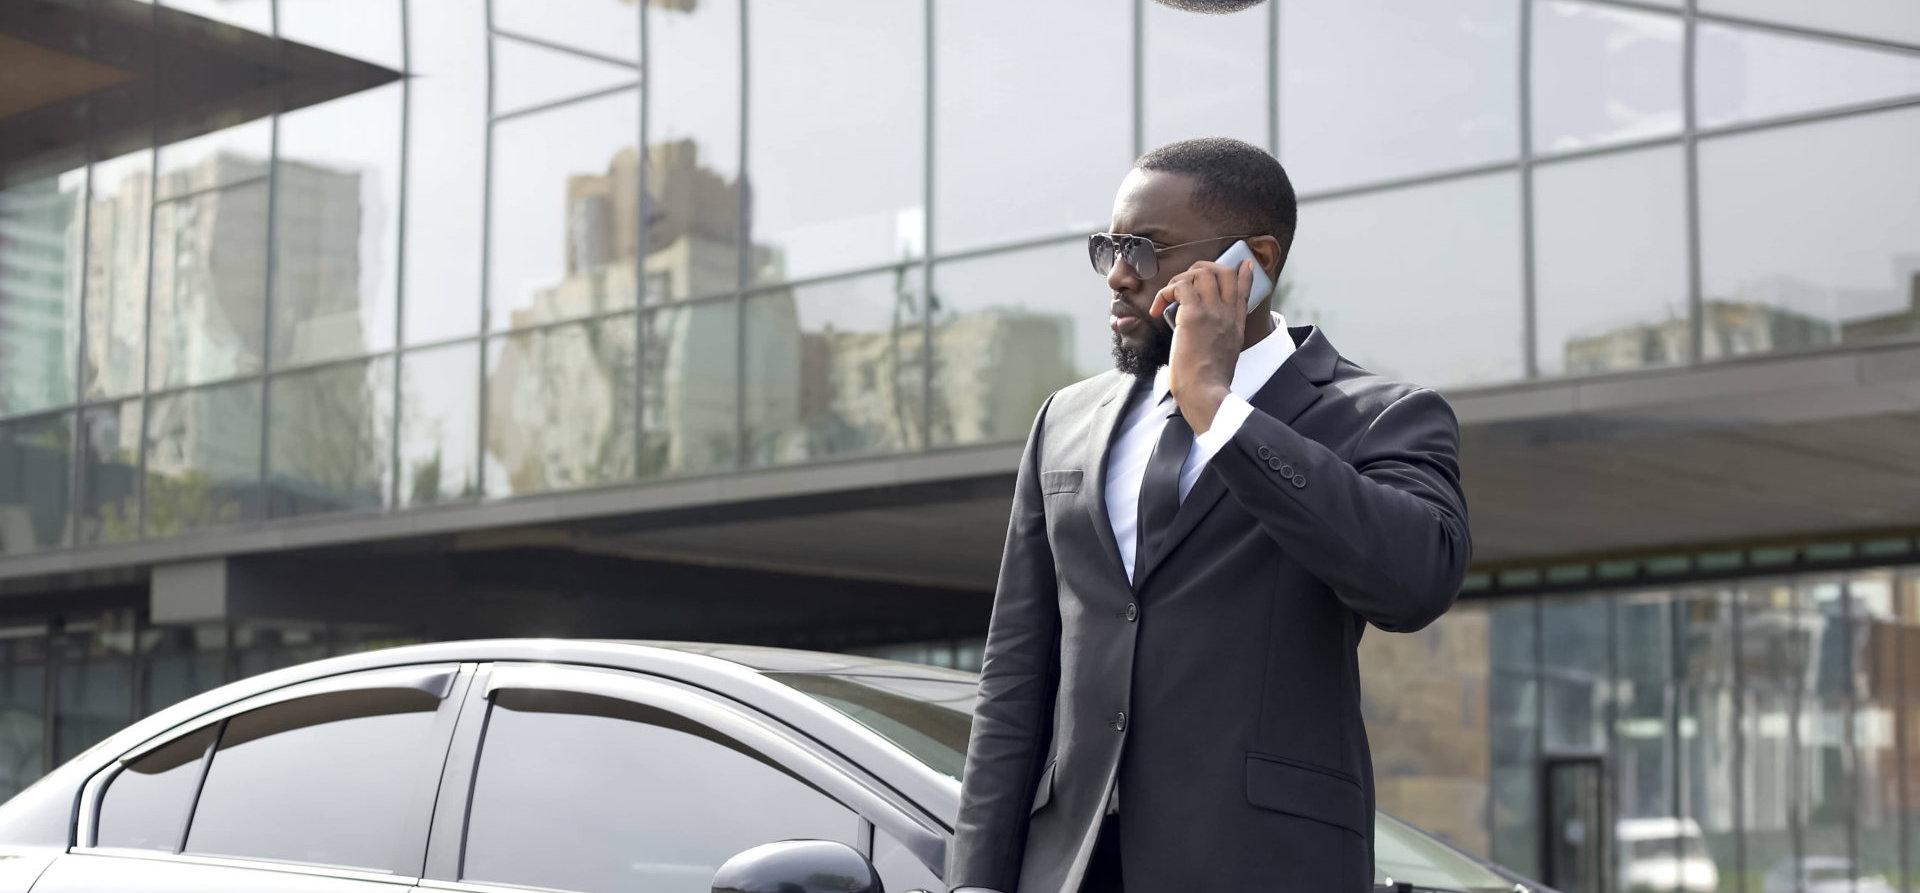 business man making a call